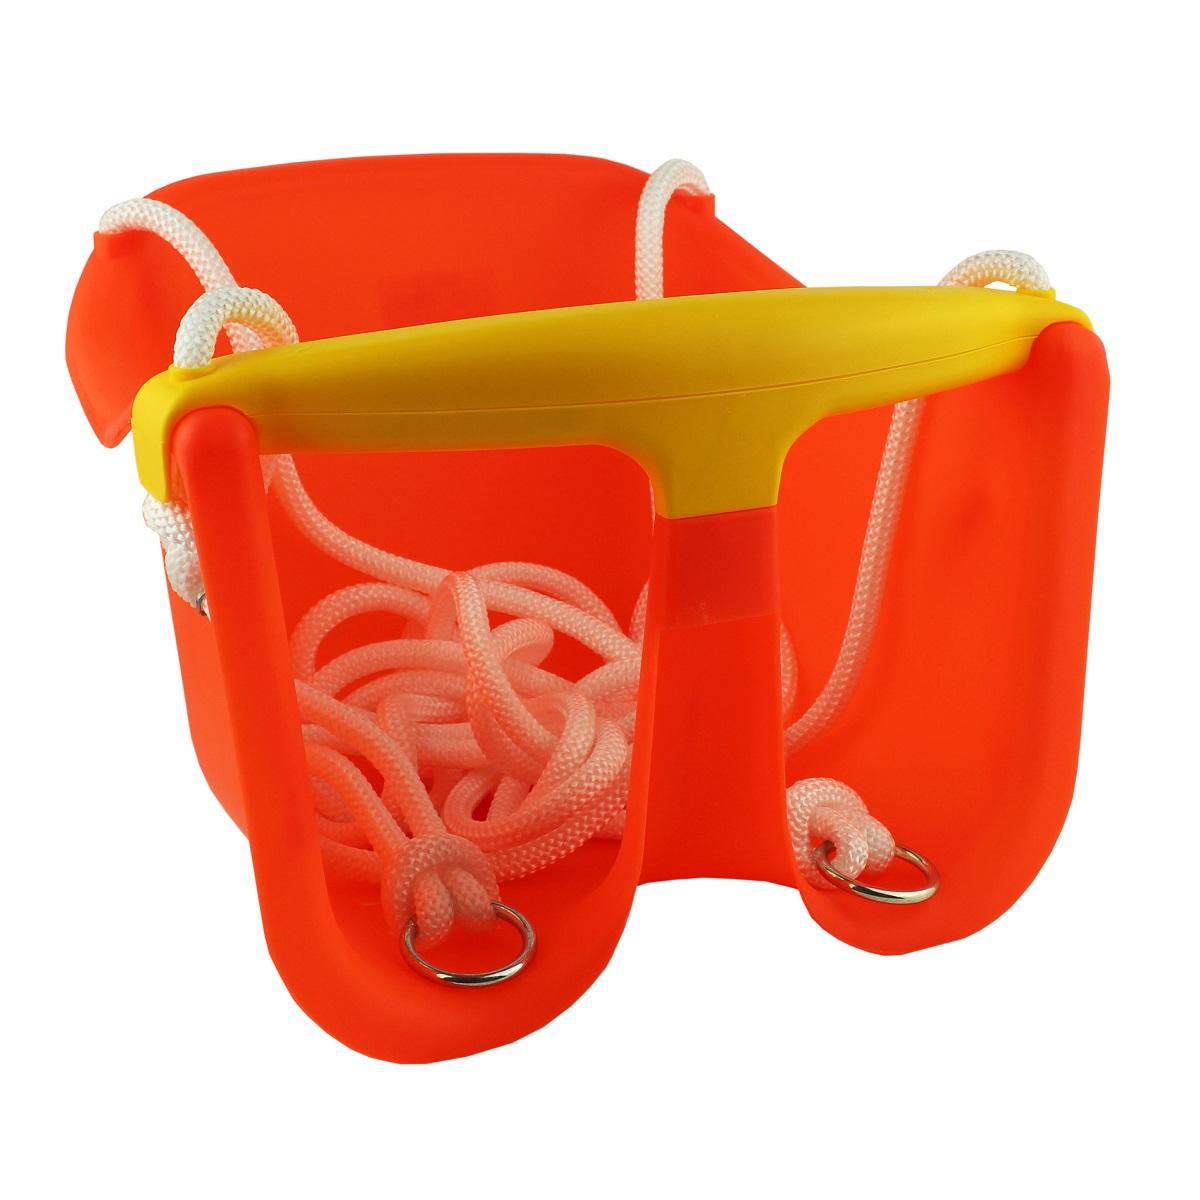 Detská hojdačka MASTER Baby plast - oranžová